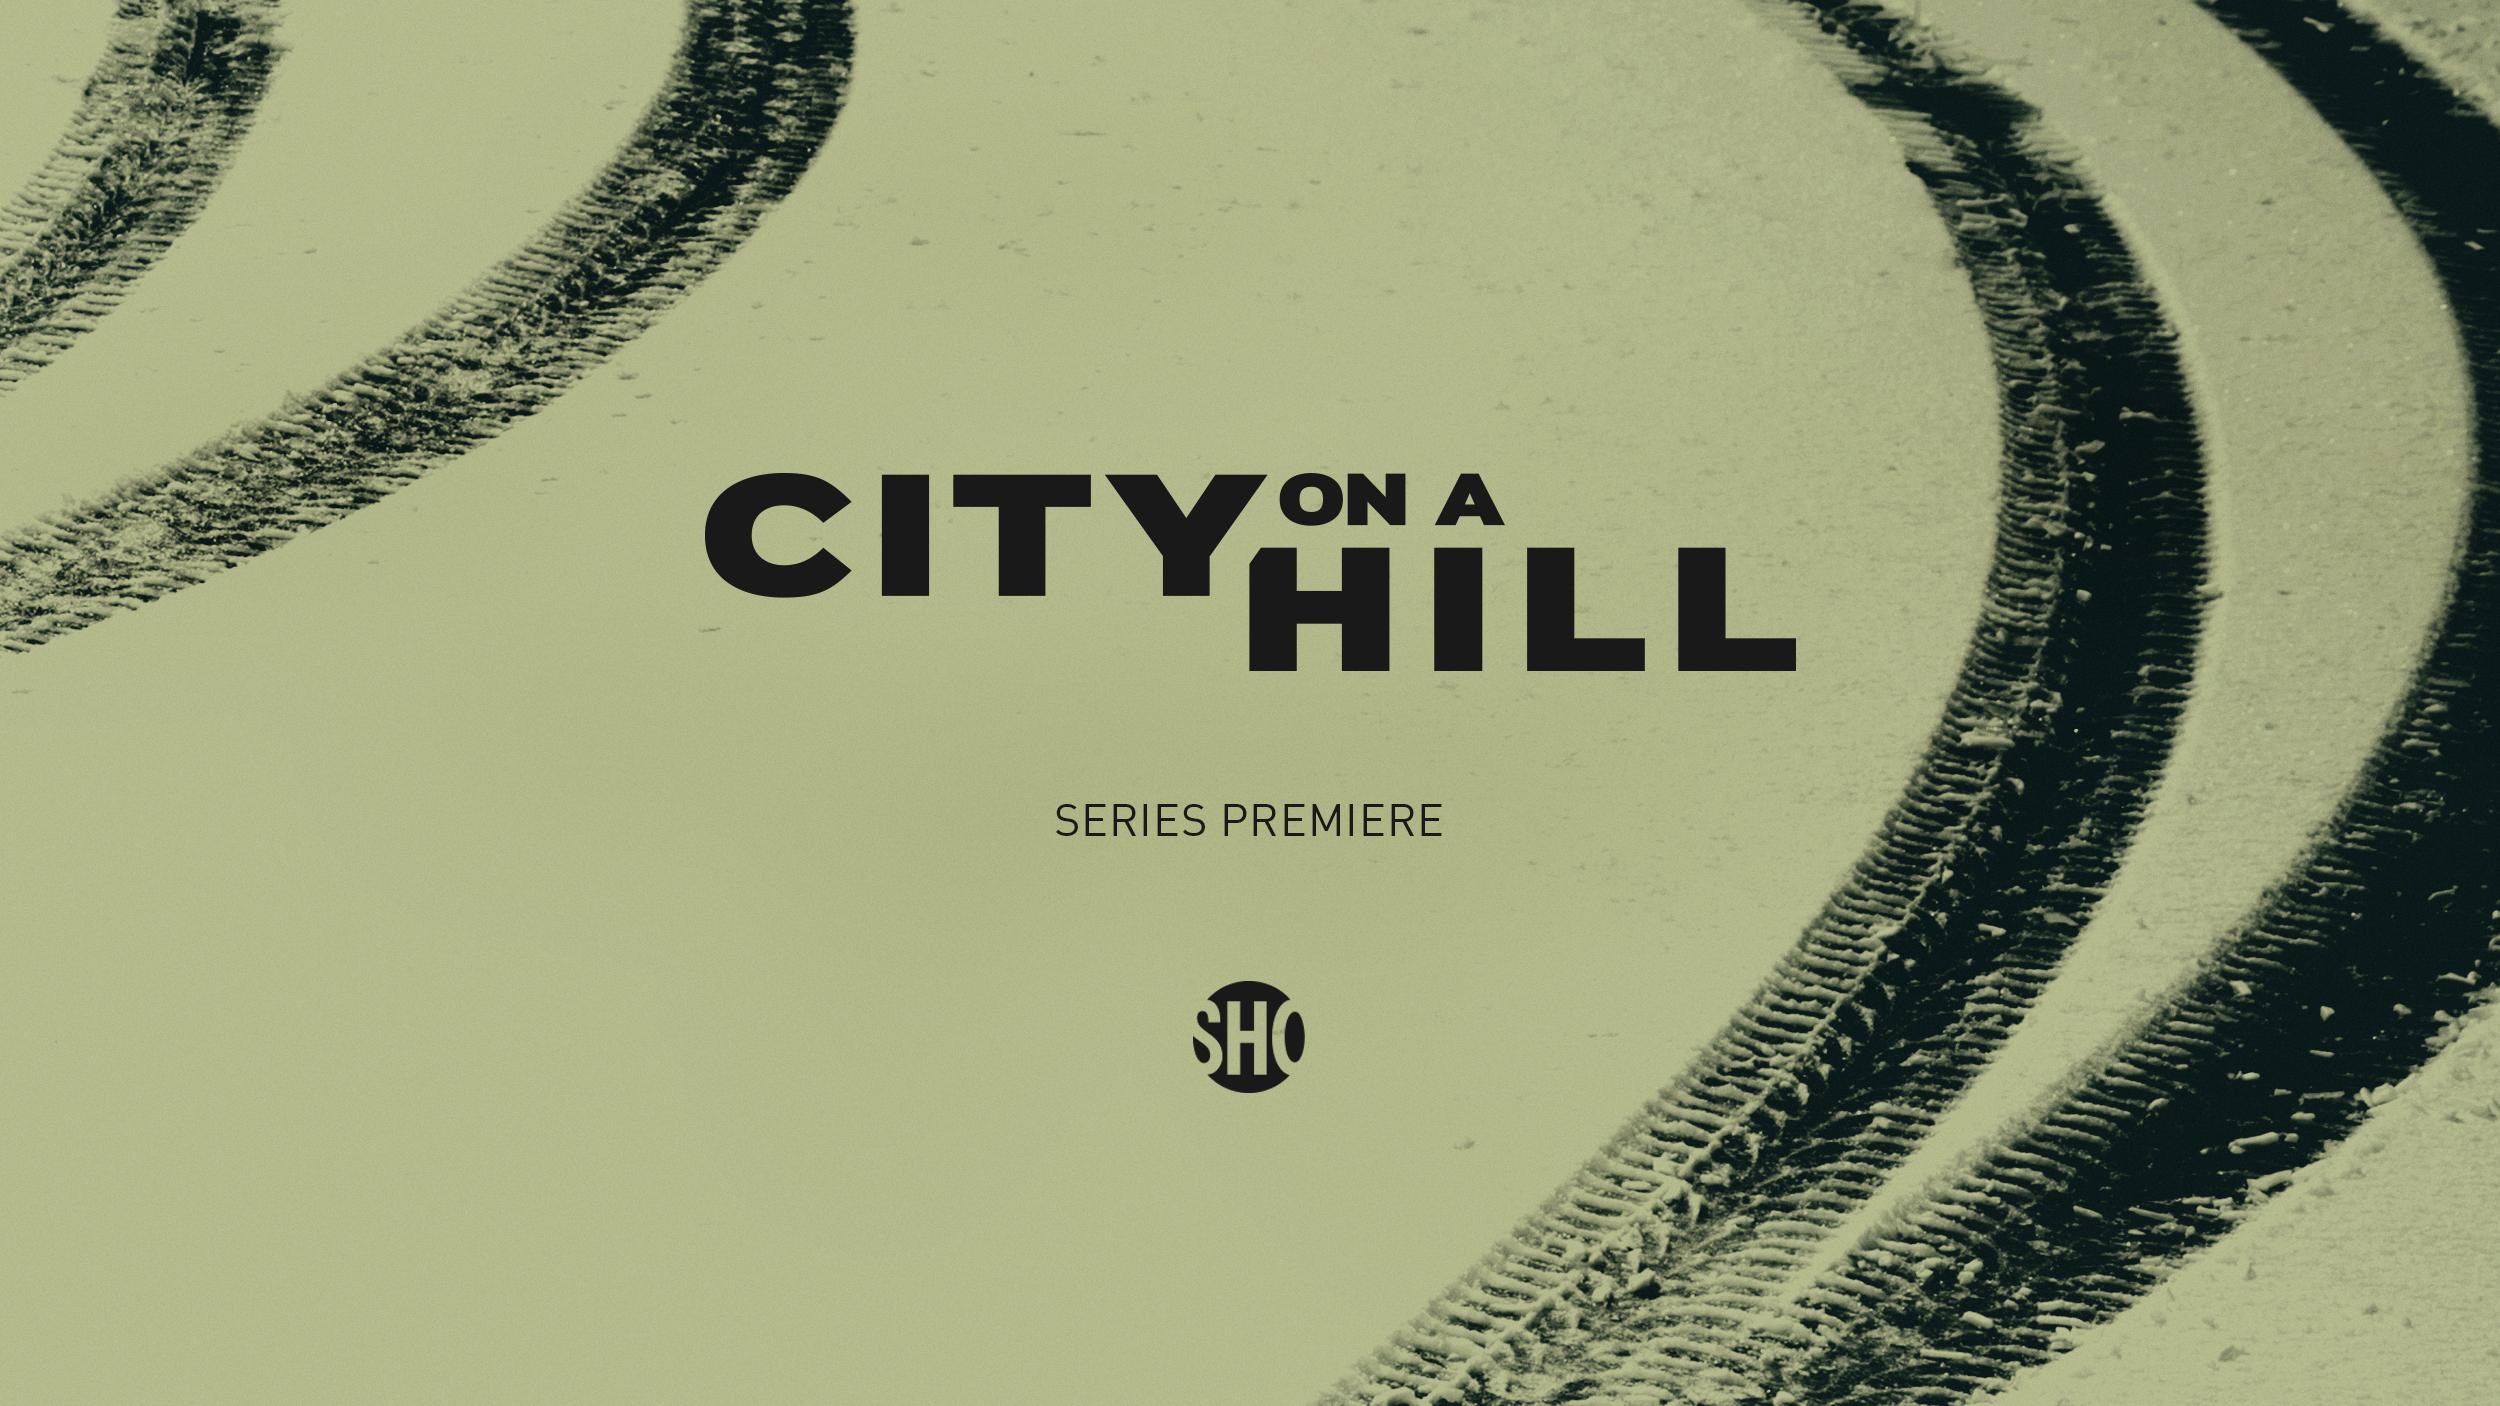 SHO_CITY_ON_A_HILL_V01_LOGO.jpg